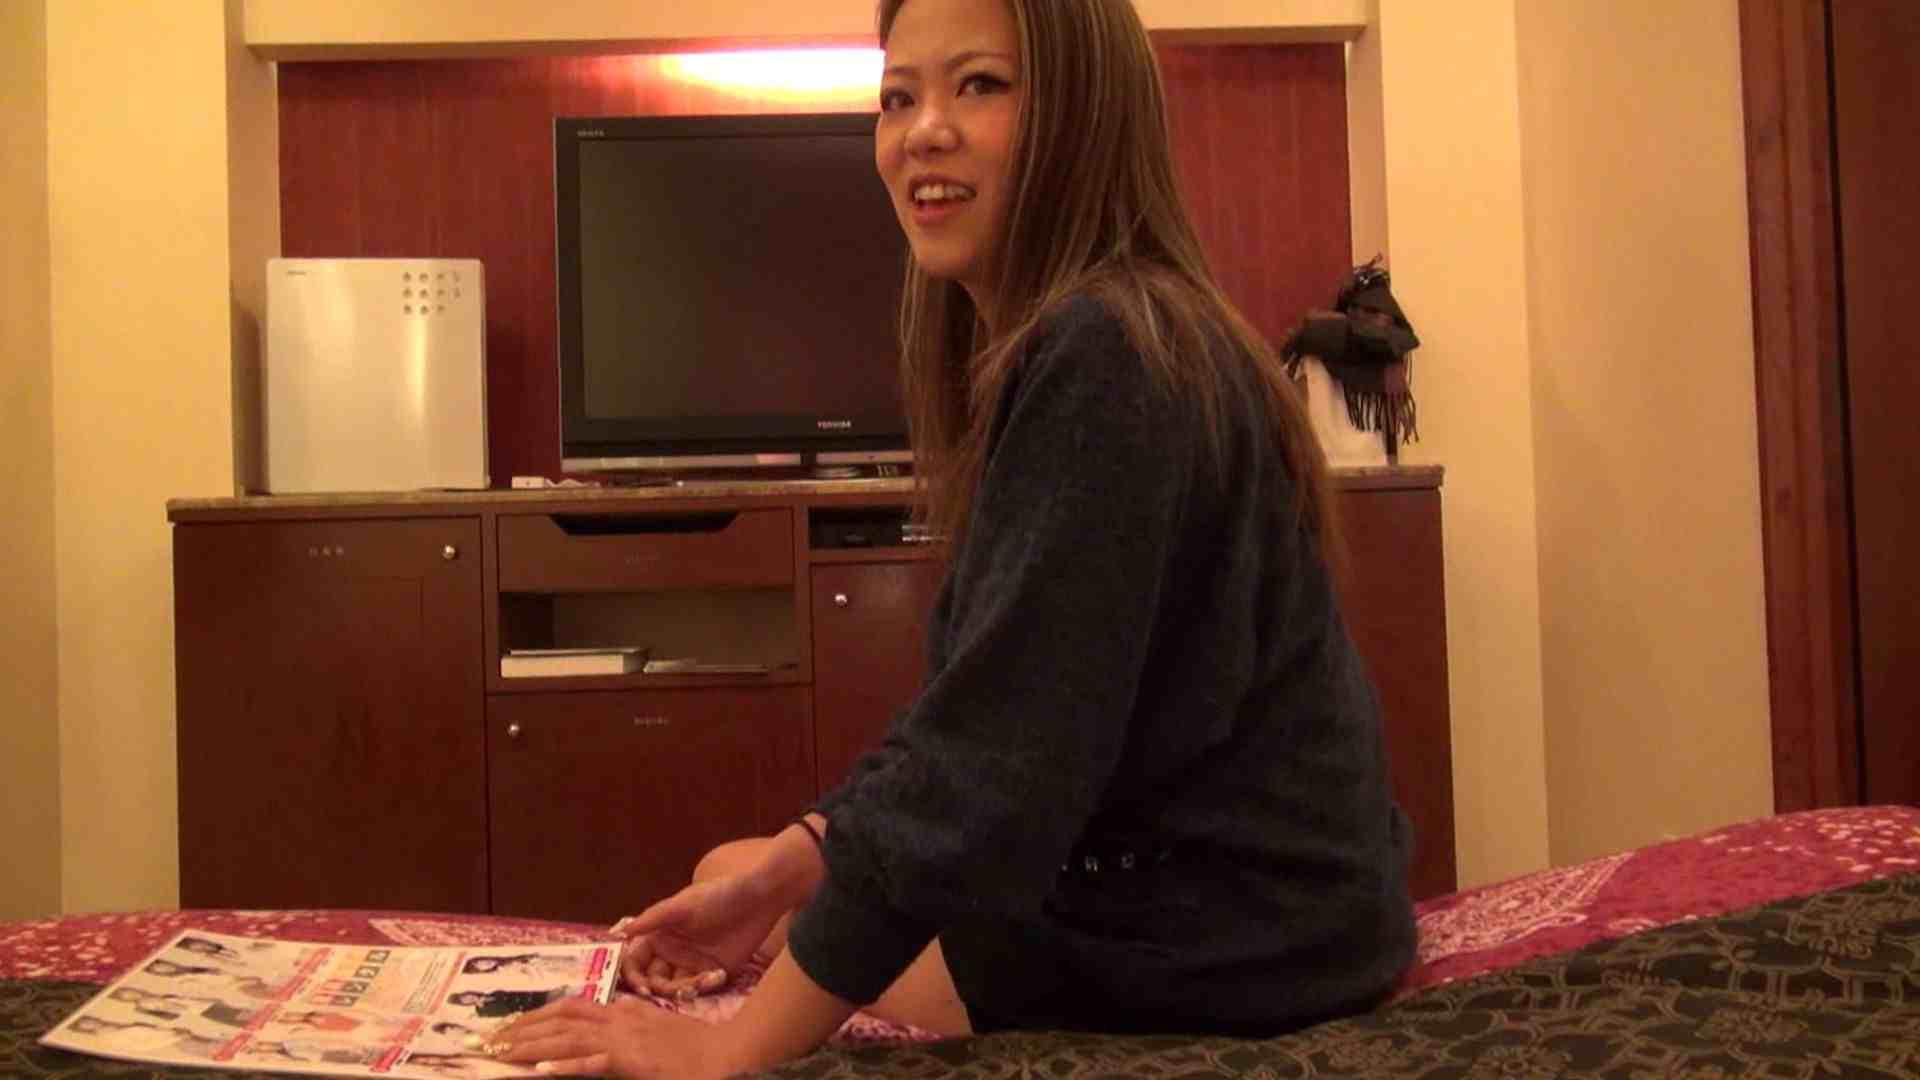 S級厳選美女ビッチガールVol.52 前編 美女エロ画像 おめこ無修正動画無料 42PICs 15